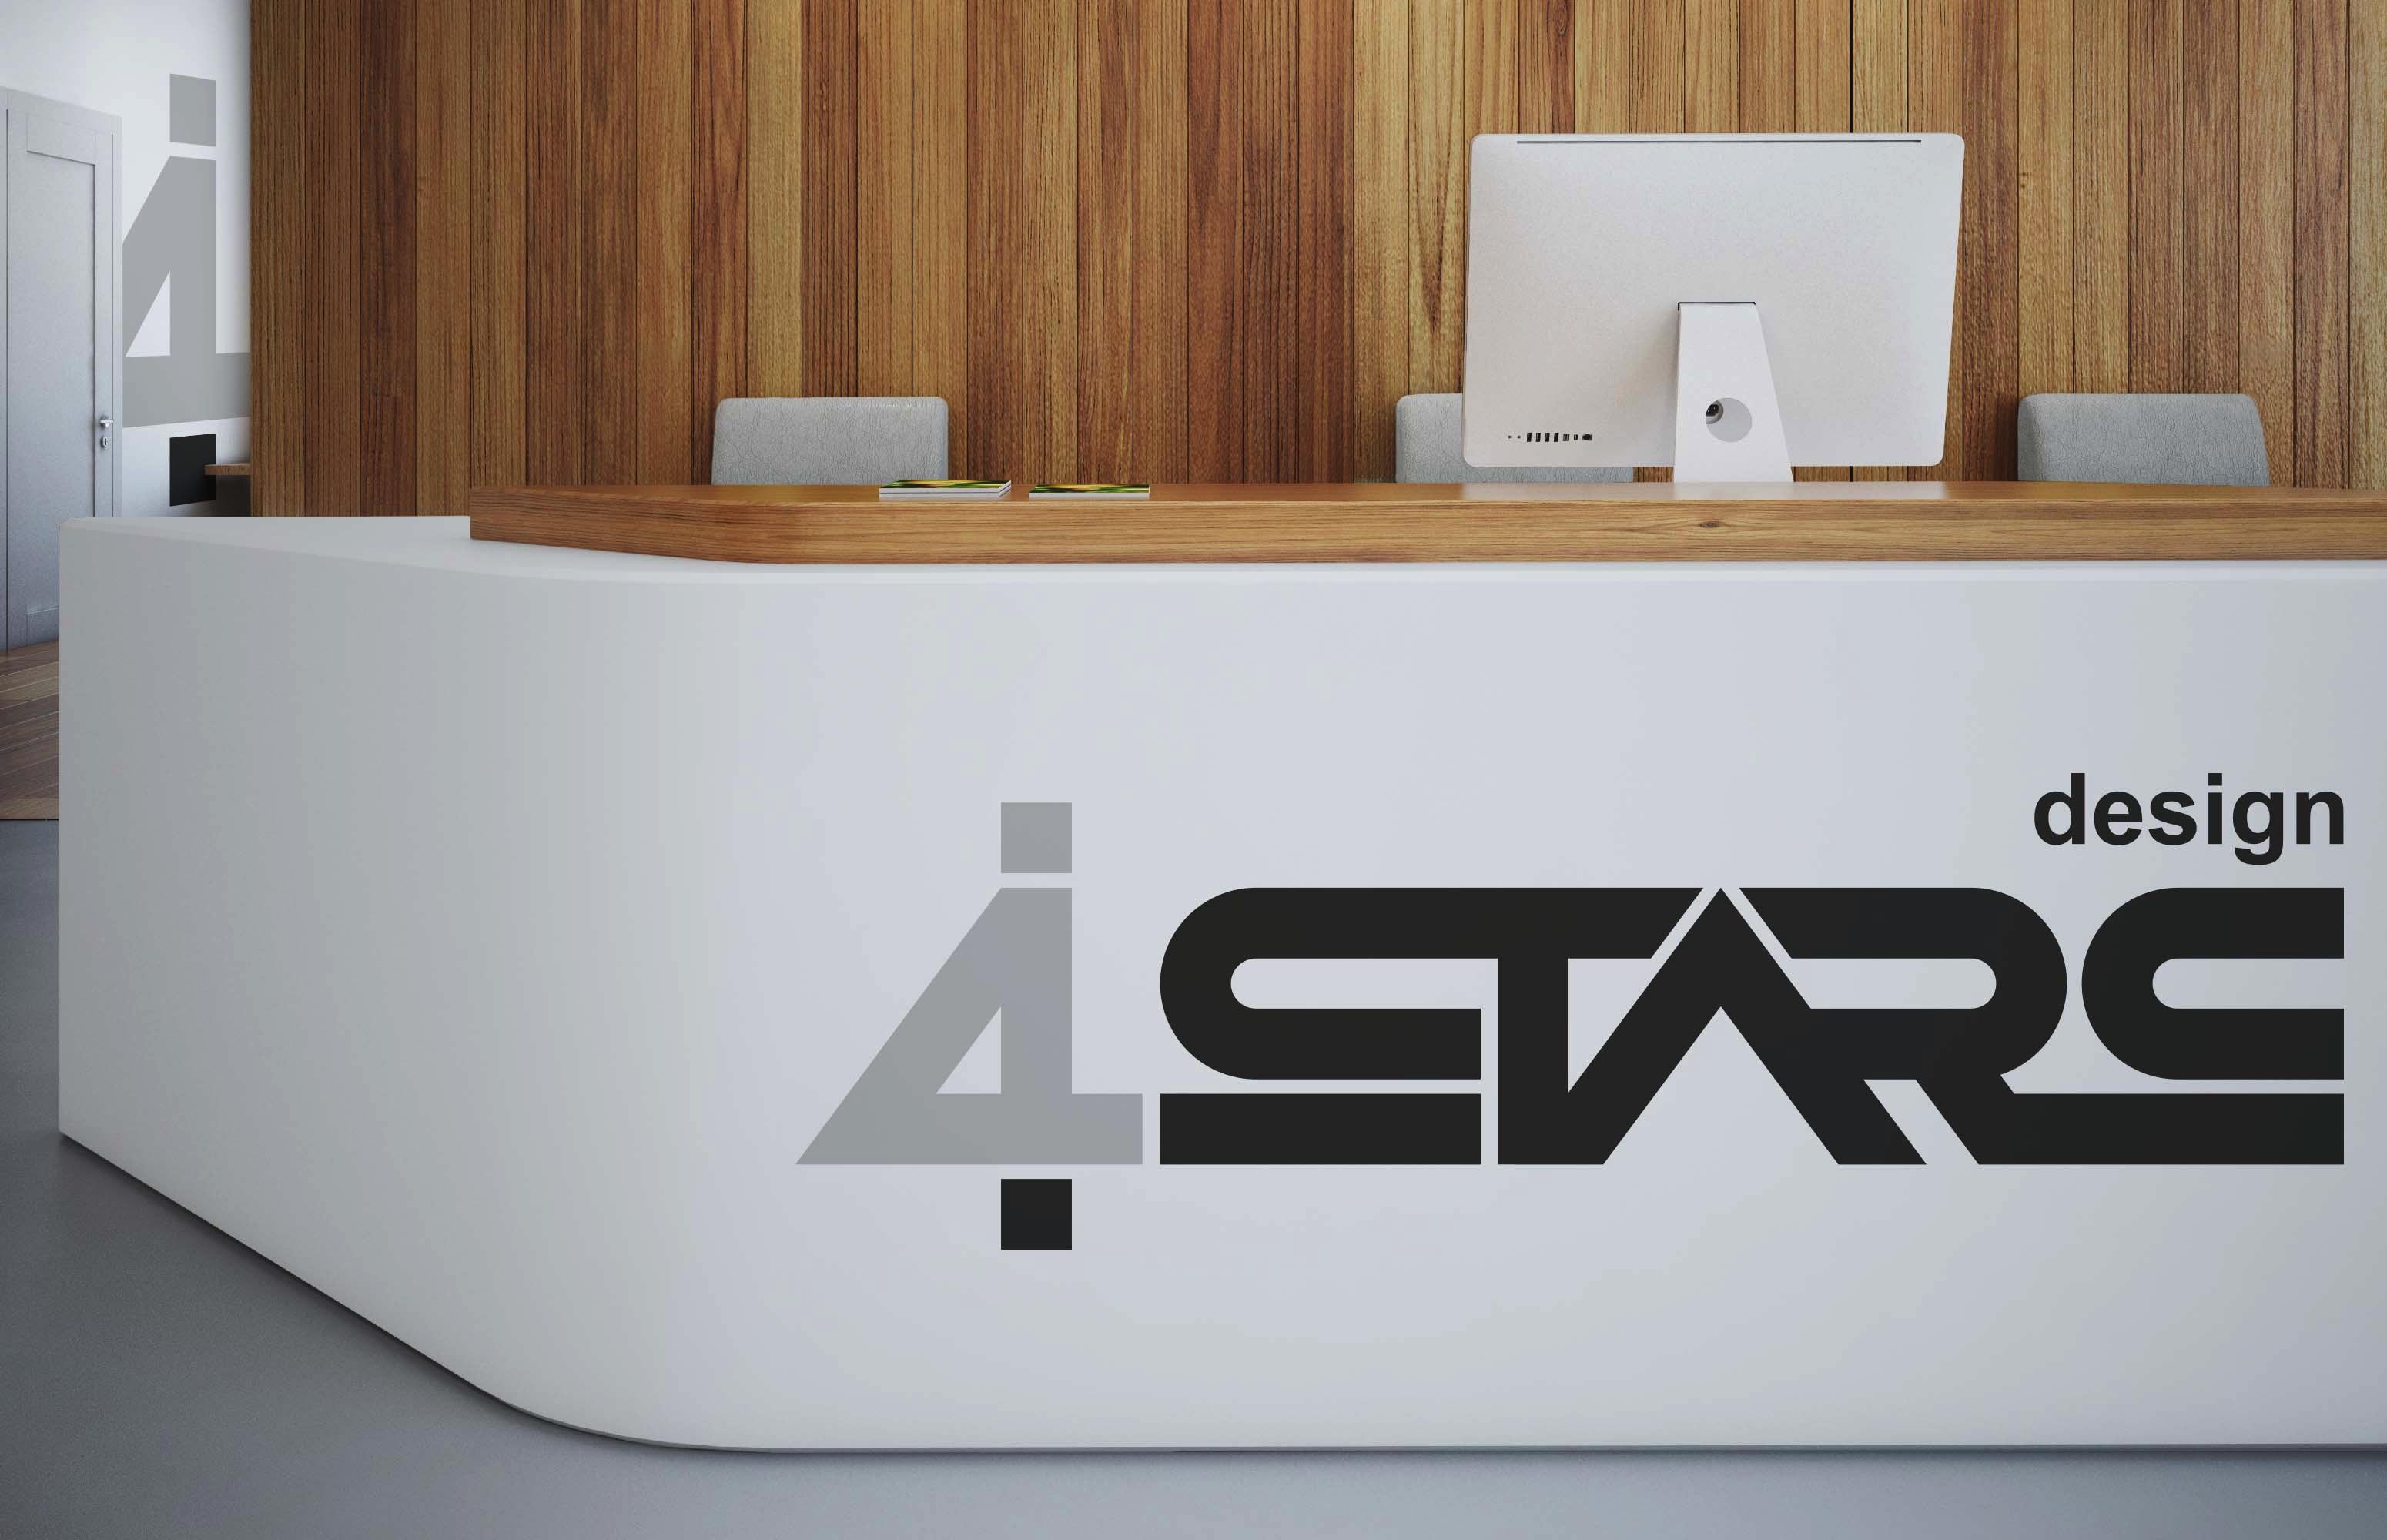 4STARS Design